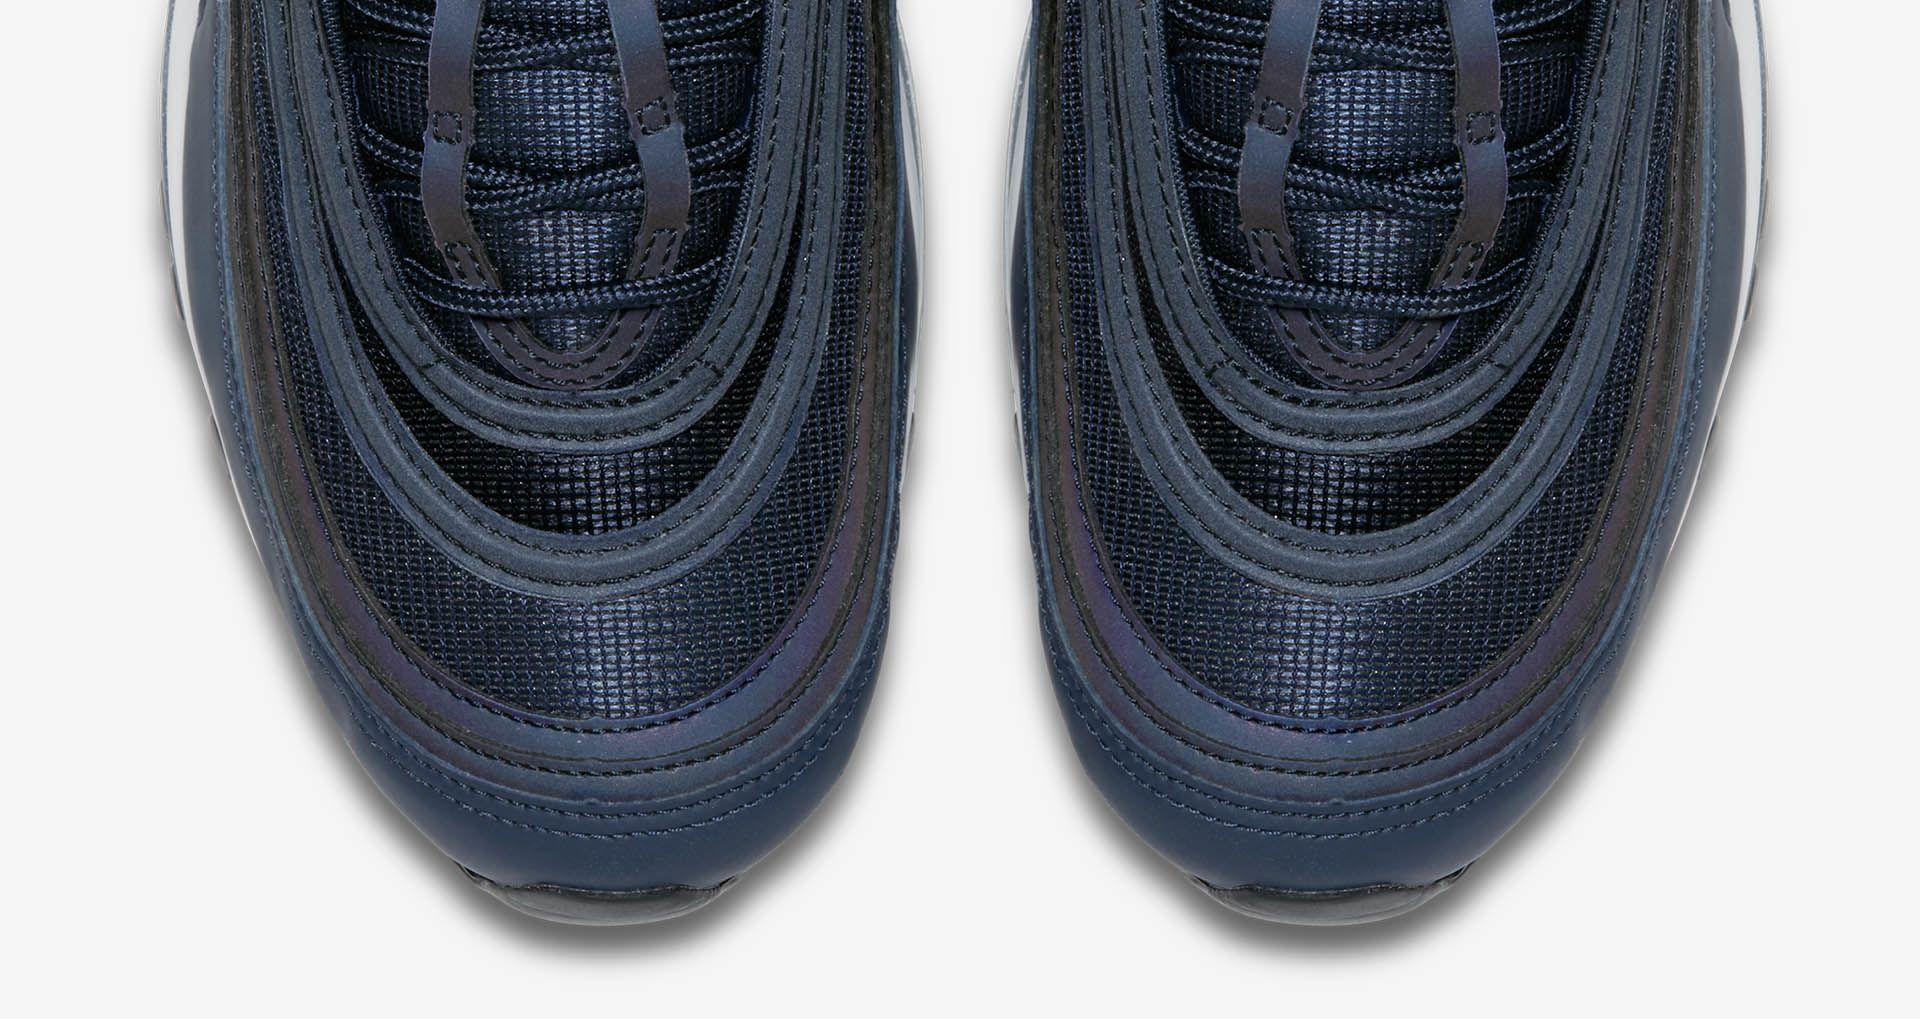 Nike Air Max 97 Eternal Future Black: Dark and Mysterious